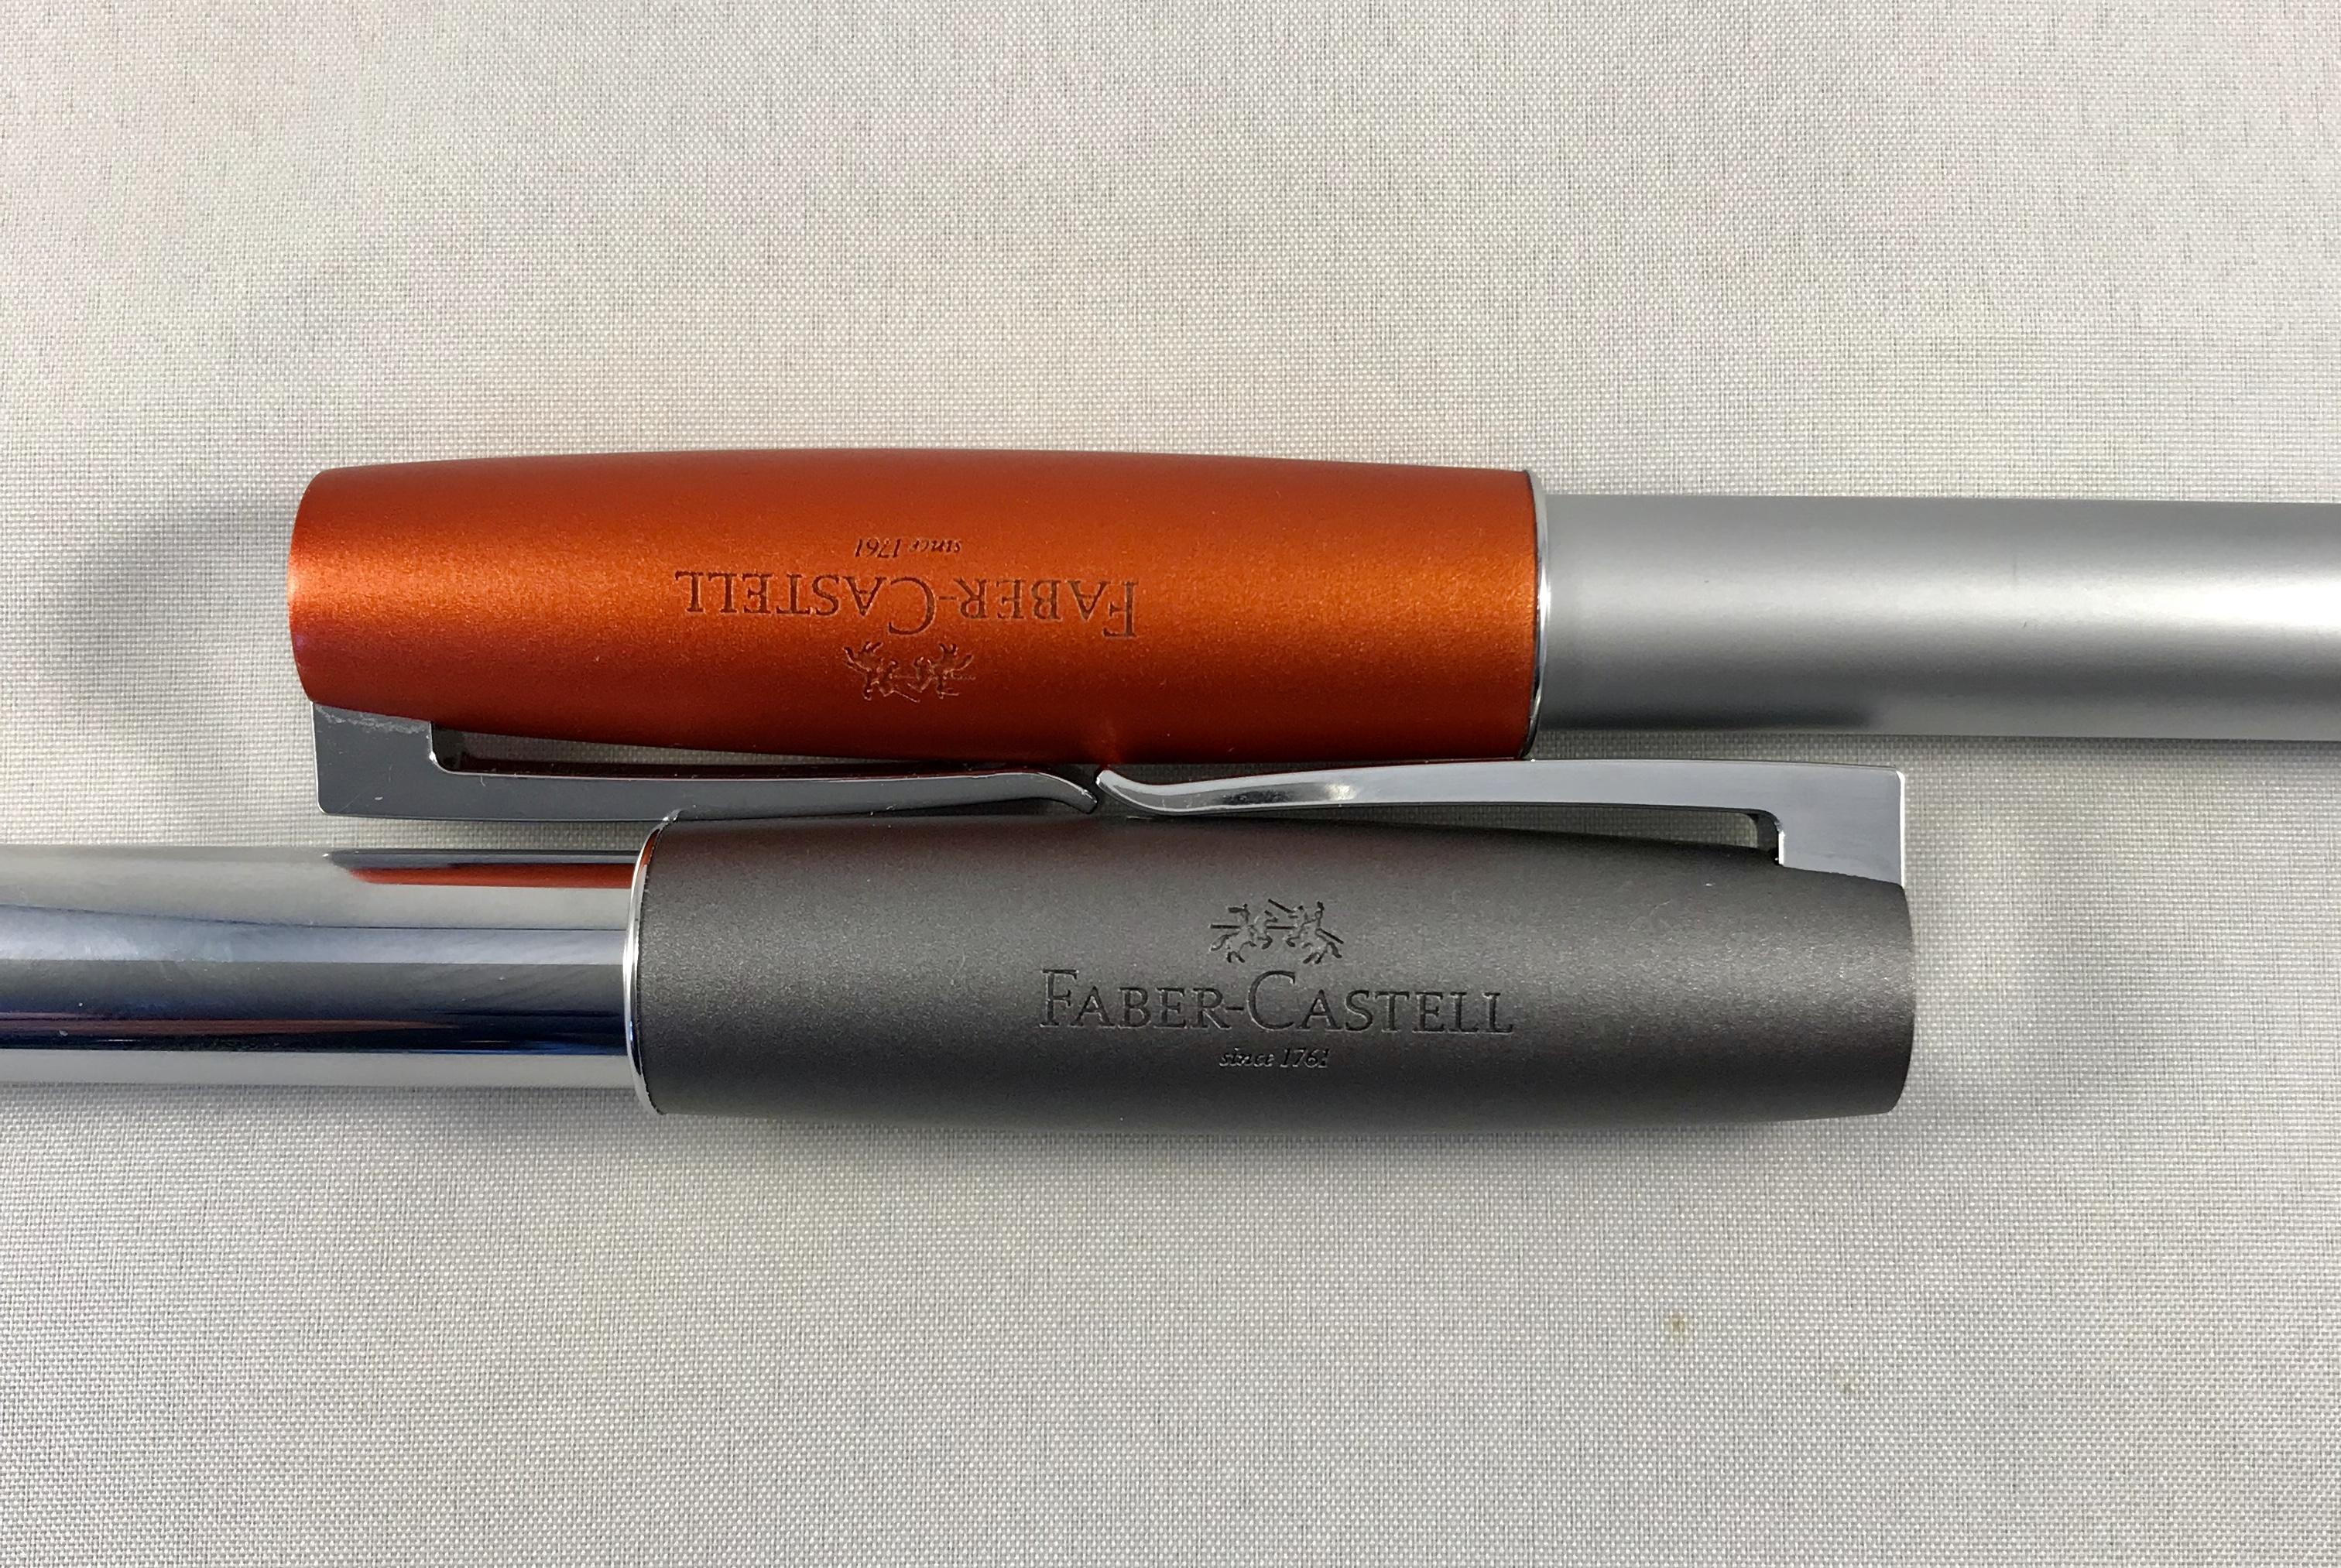 Faber-Castell Loom cap detail